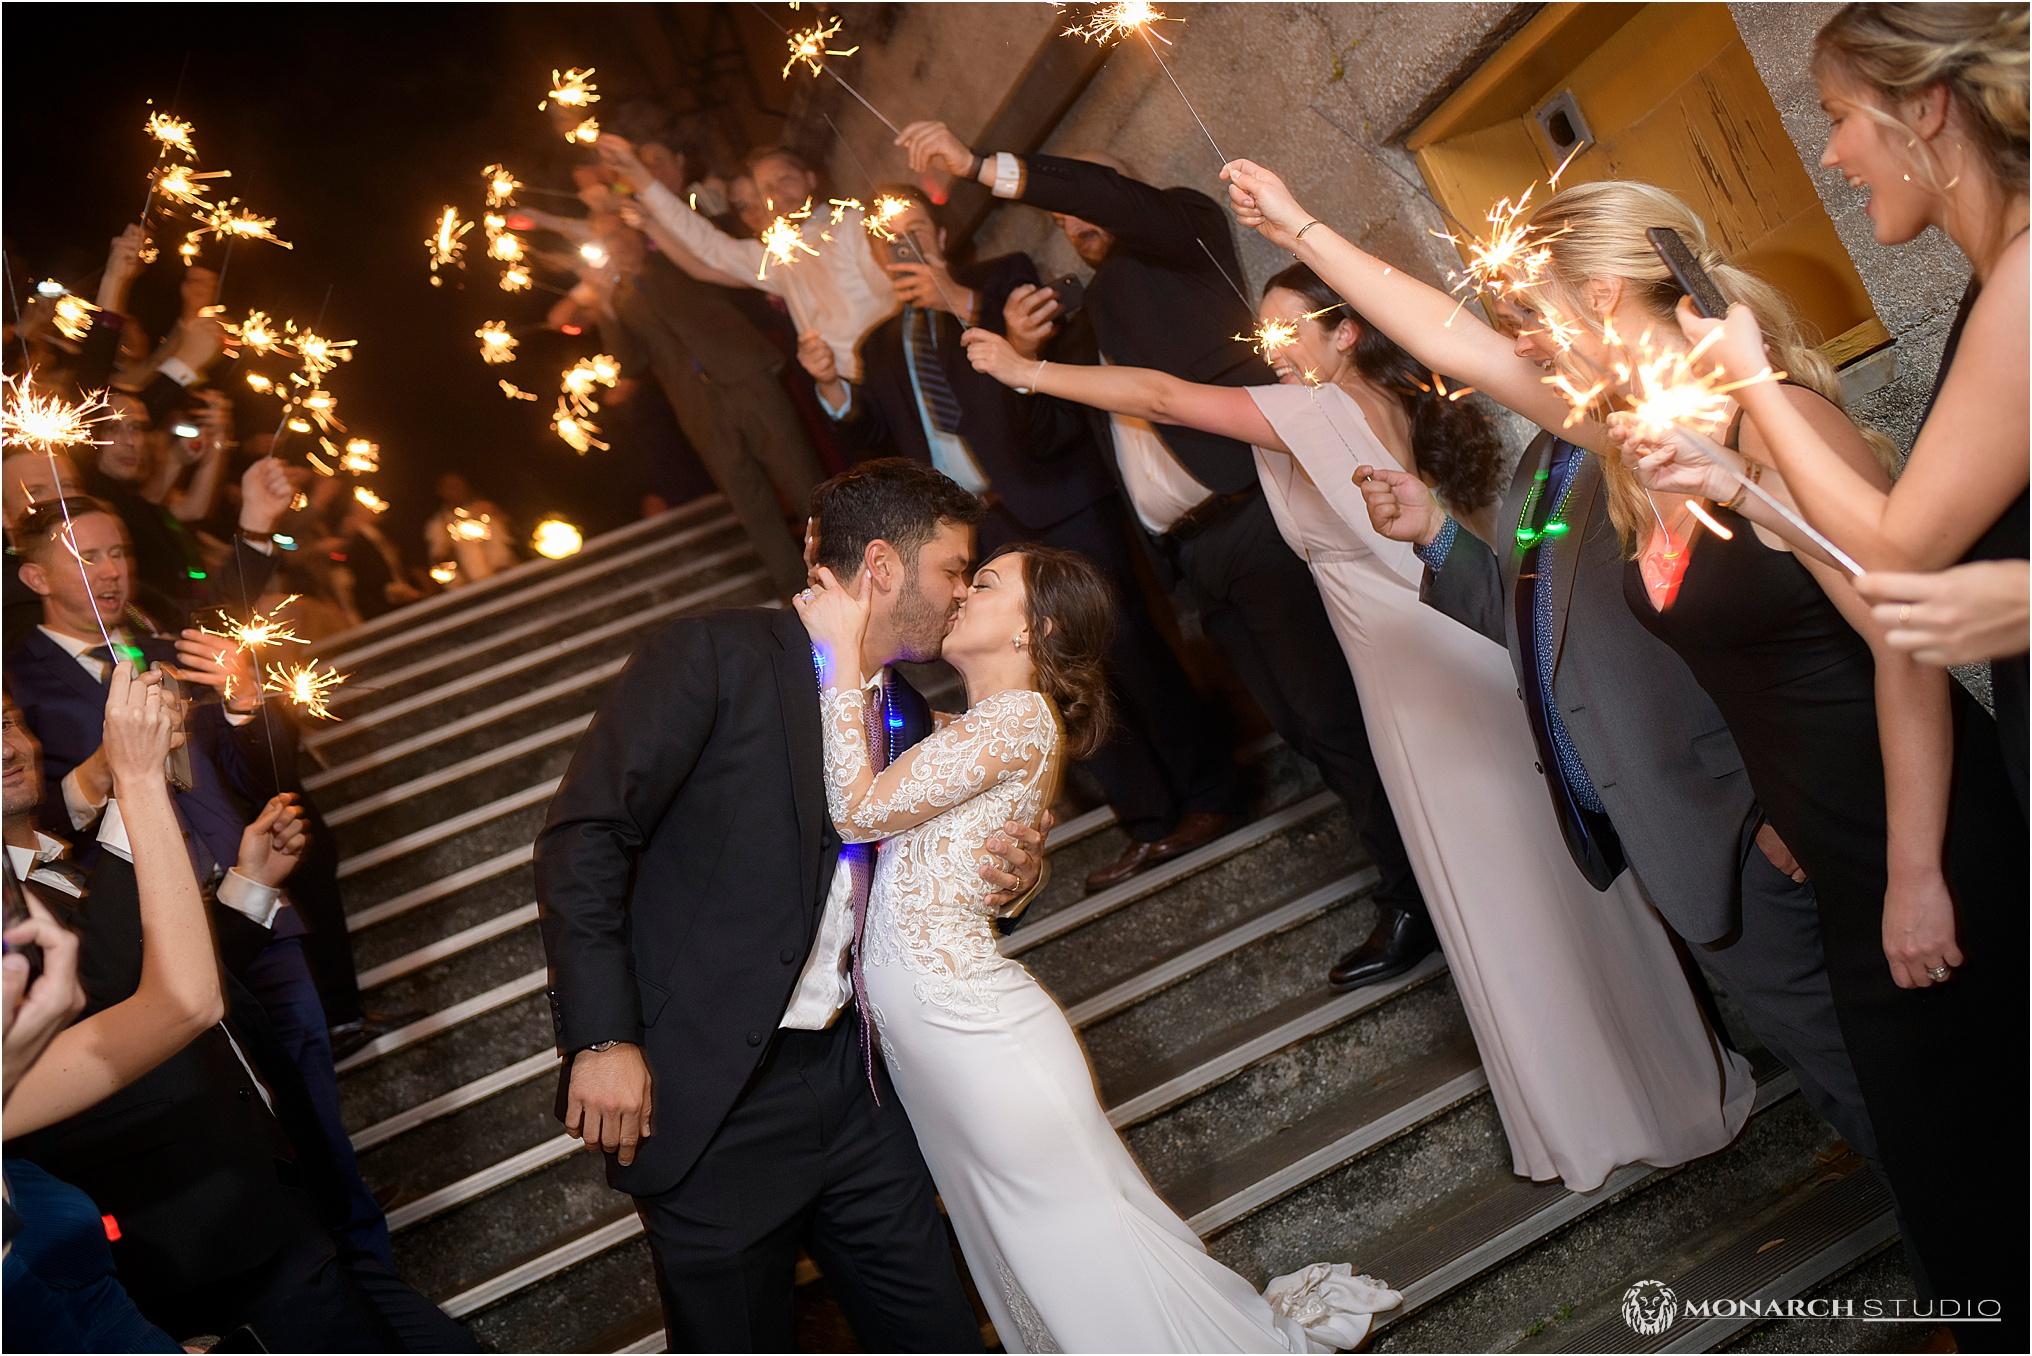 st-augustine-high-end-wedding-photographers-164.jpg